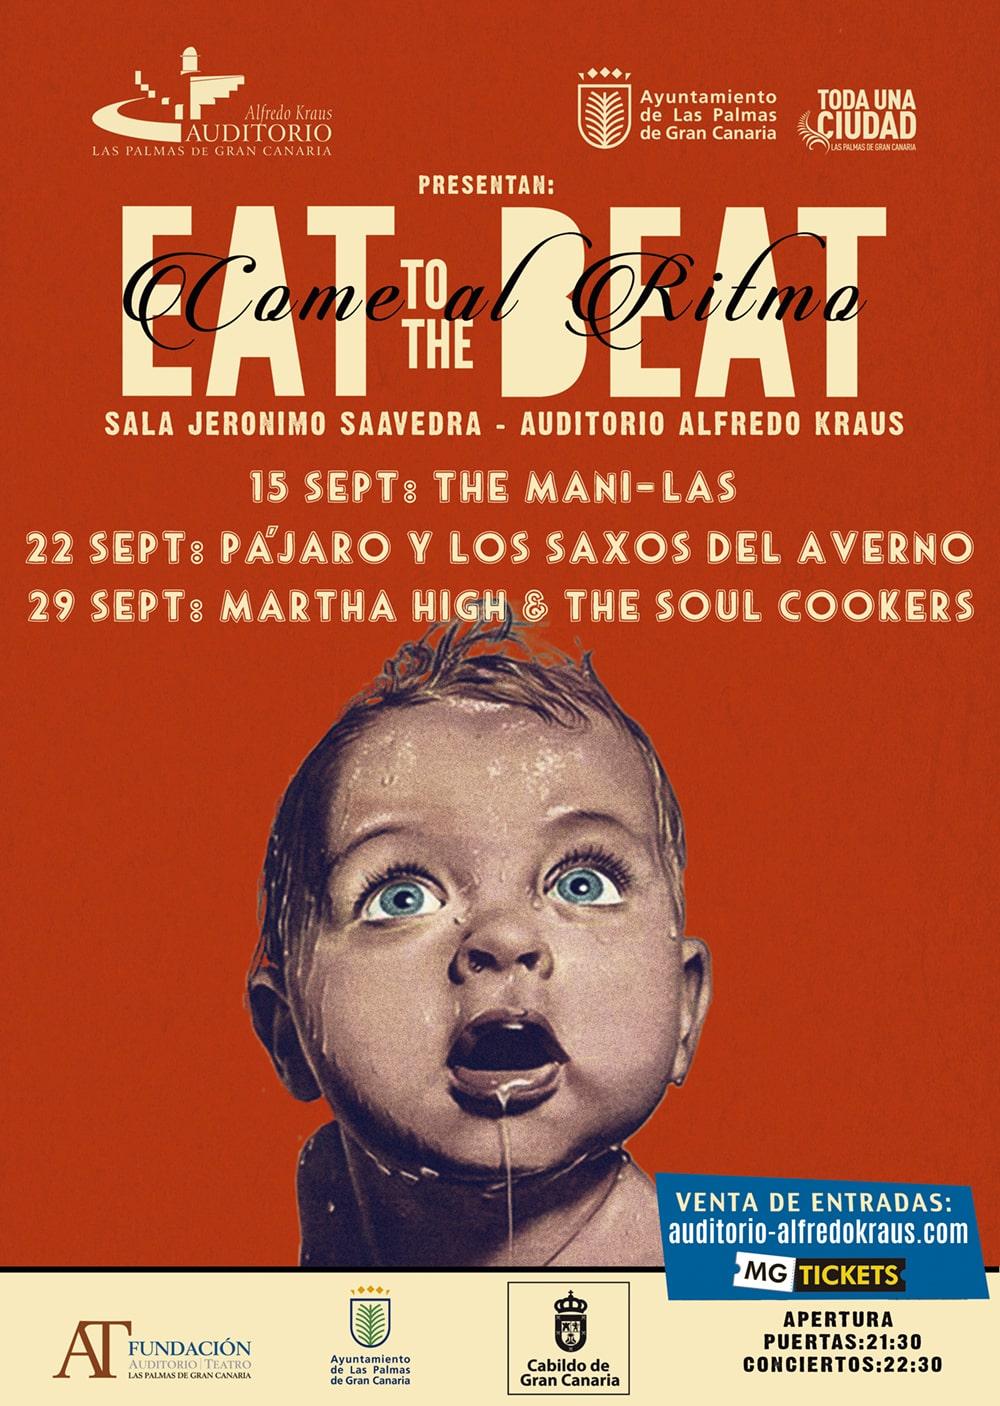 Tercera Edición Eat To The Beat en Gran Canaria